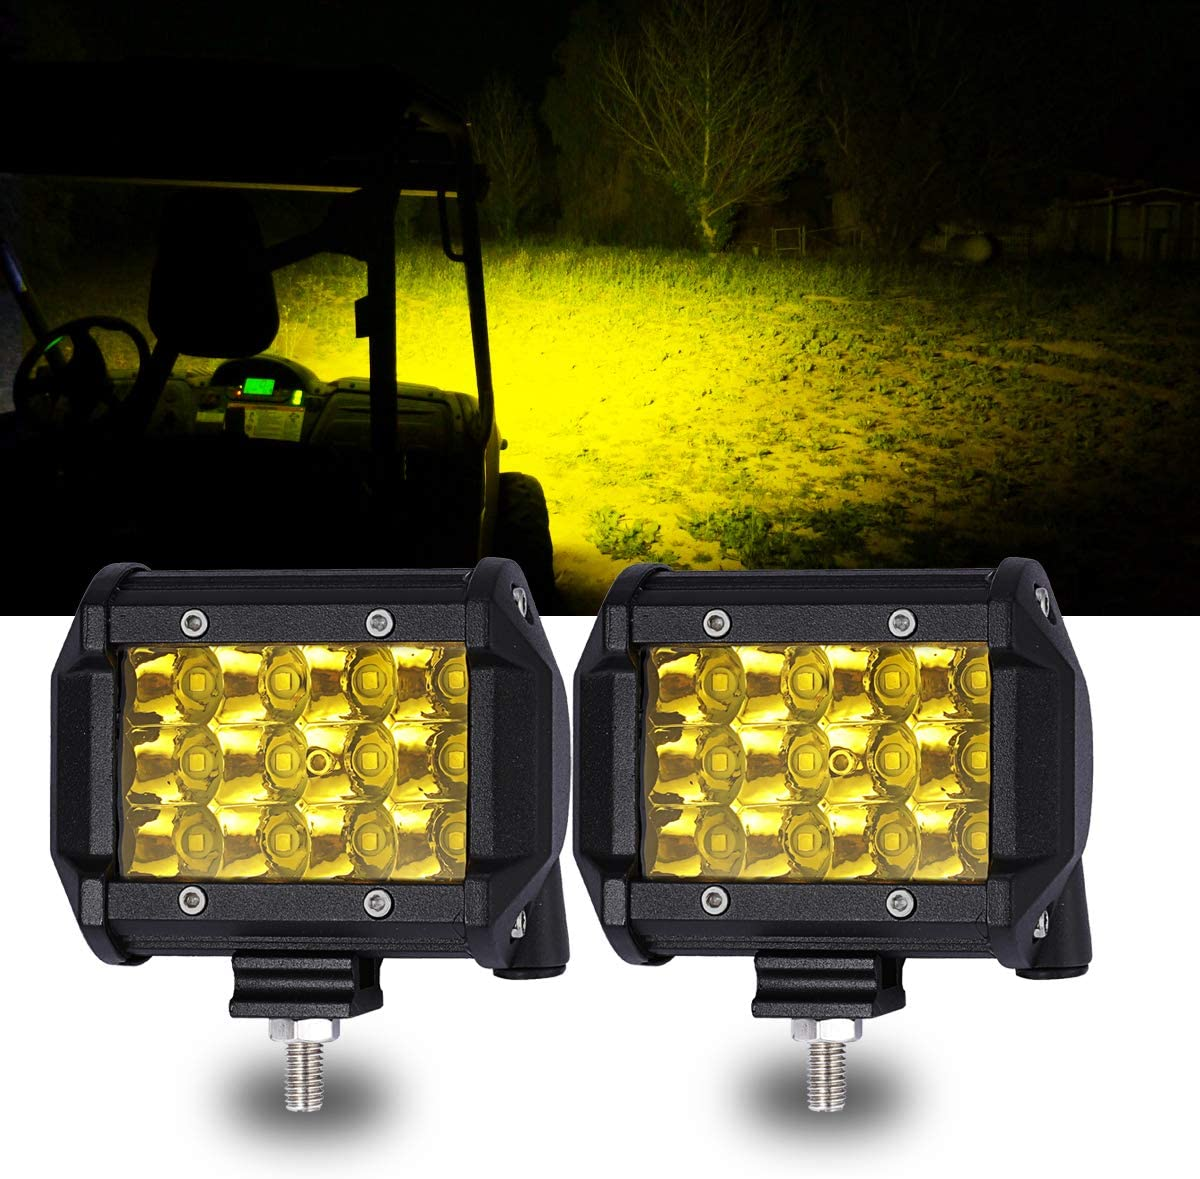 samman 6Inch Yellow LED Light Bar 18W 3000K Spot Light Amber Single Row Driving Off Road Fog Light for Trucks Boat Camping Tractor ATV UTV SUV Jp 2PCS